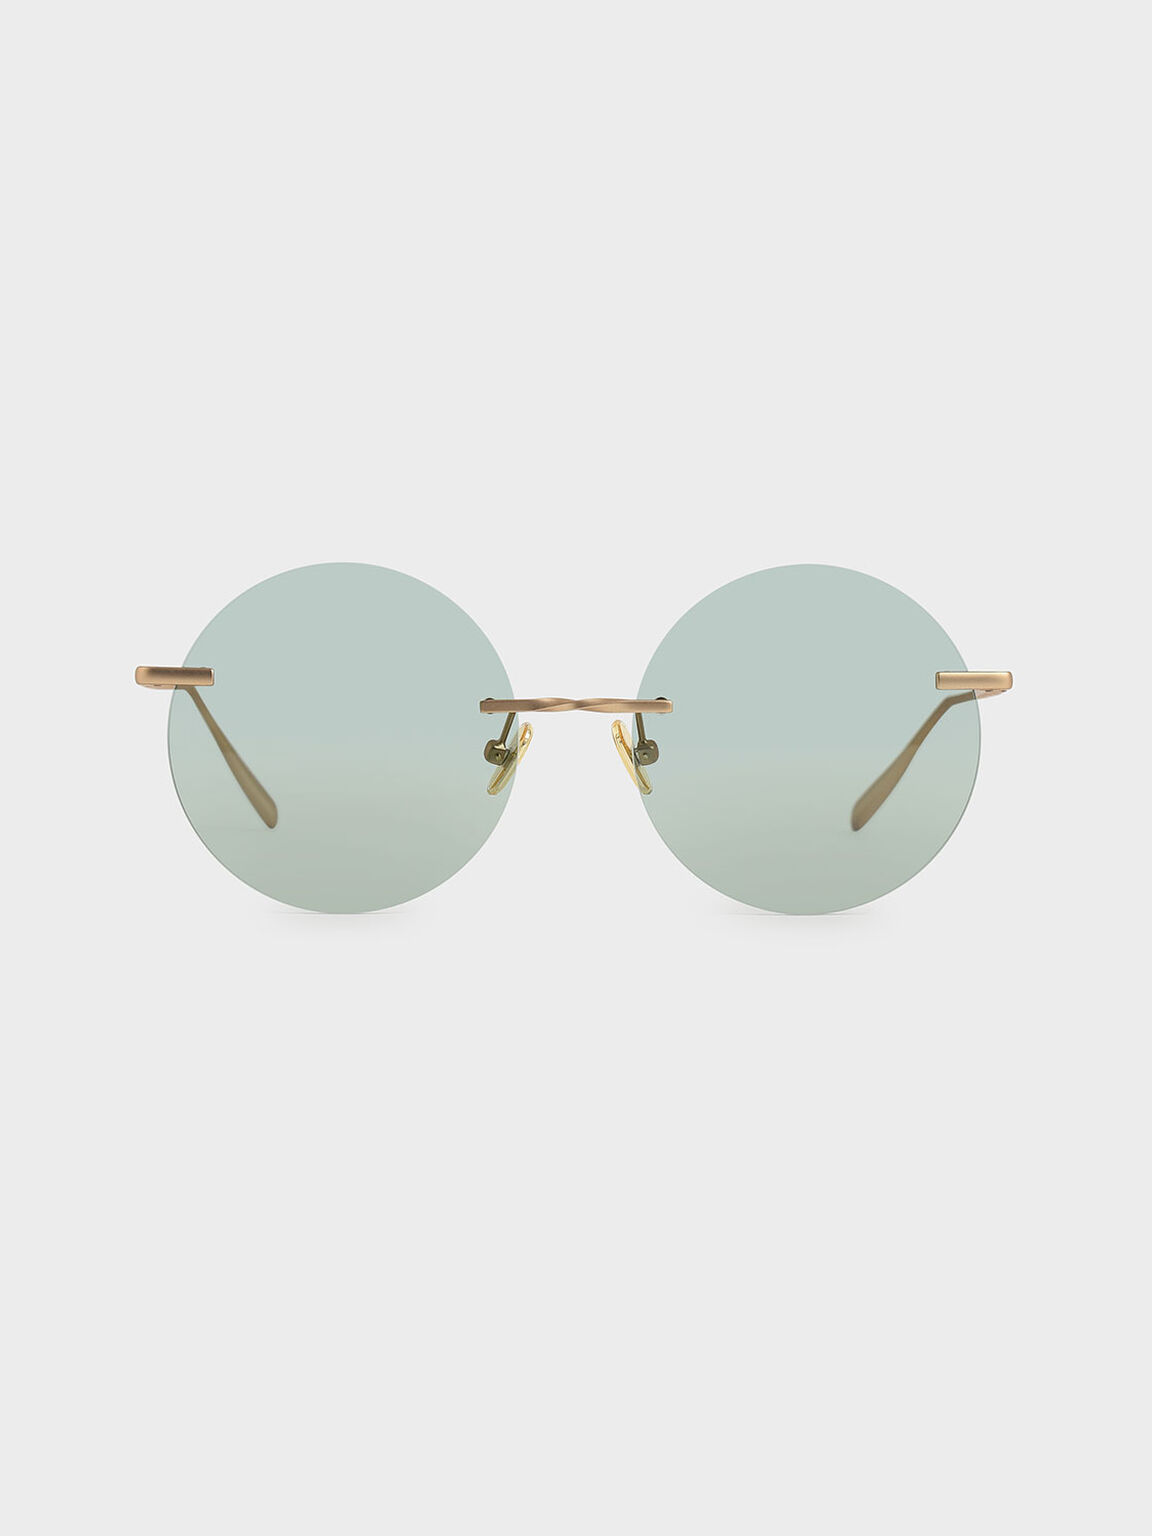 Round Rimless Sunglasses, Green, hi-res